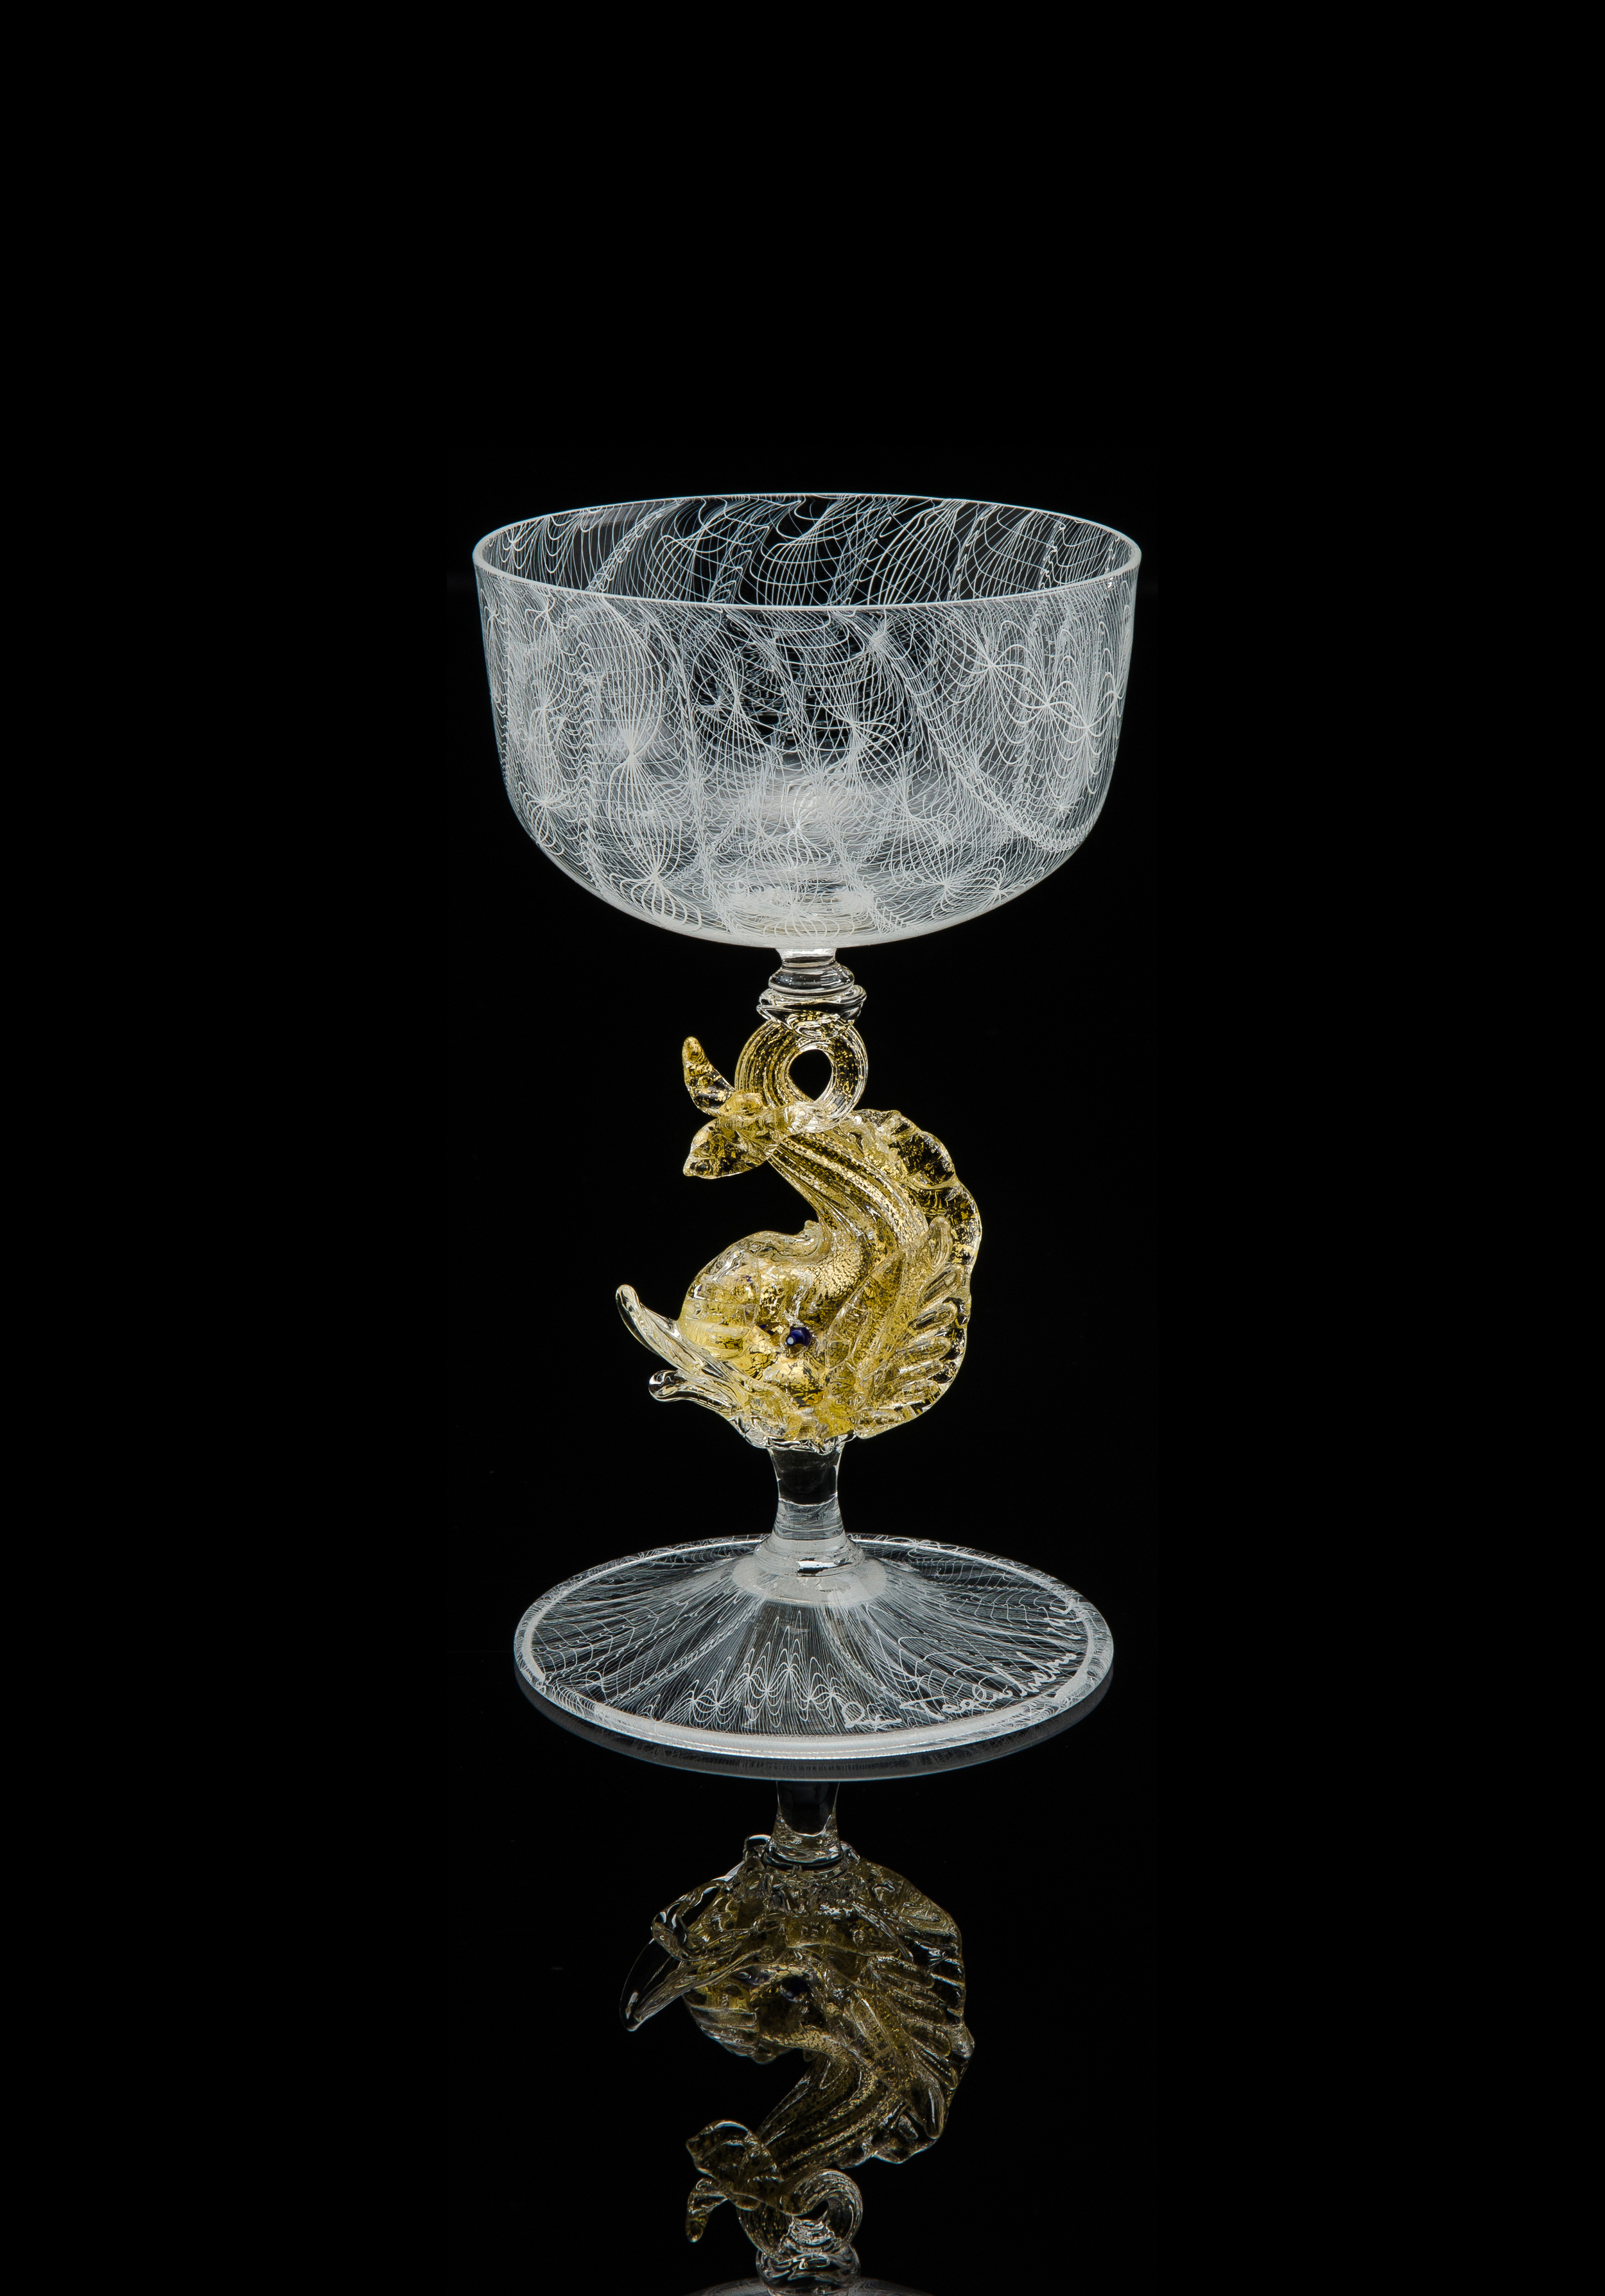 Lino Tagliapietra, Goblet (1991-1994, glass, 6 1/2 x 3 7/8 x 3 7/8 inches), LT.84